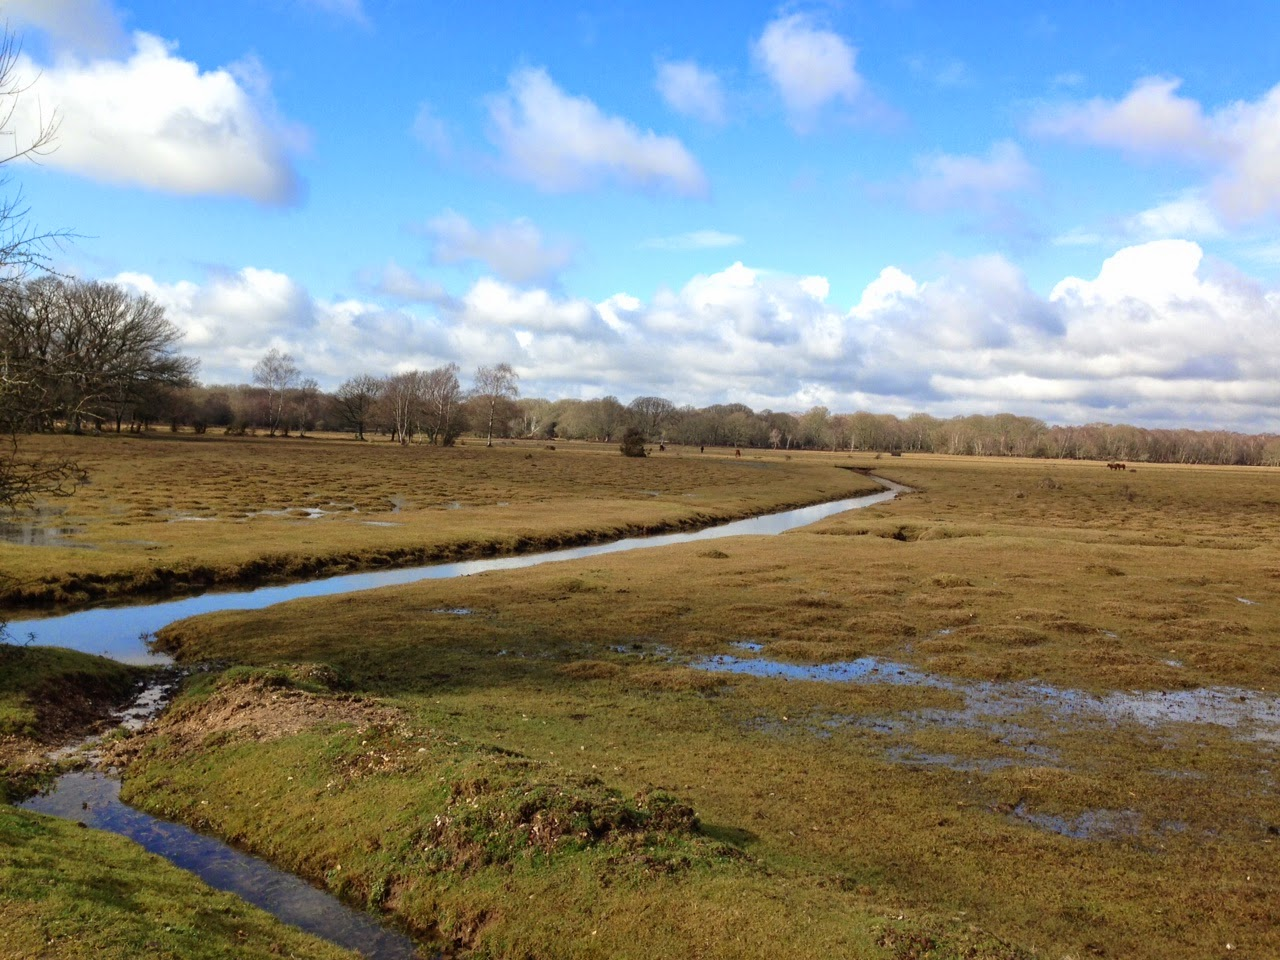 Common land at Brockenhurst in the New Forest